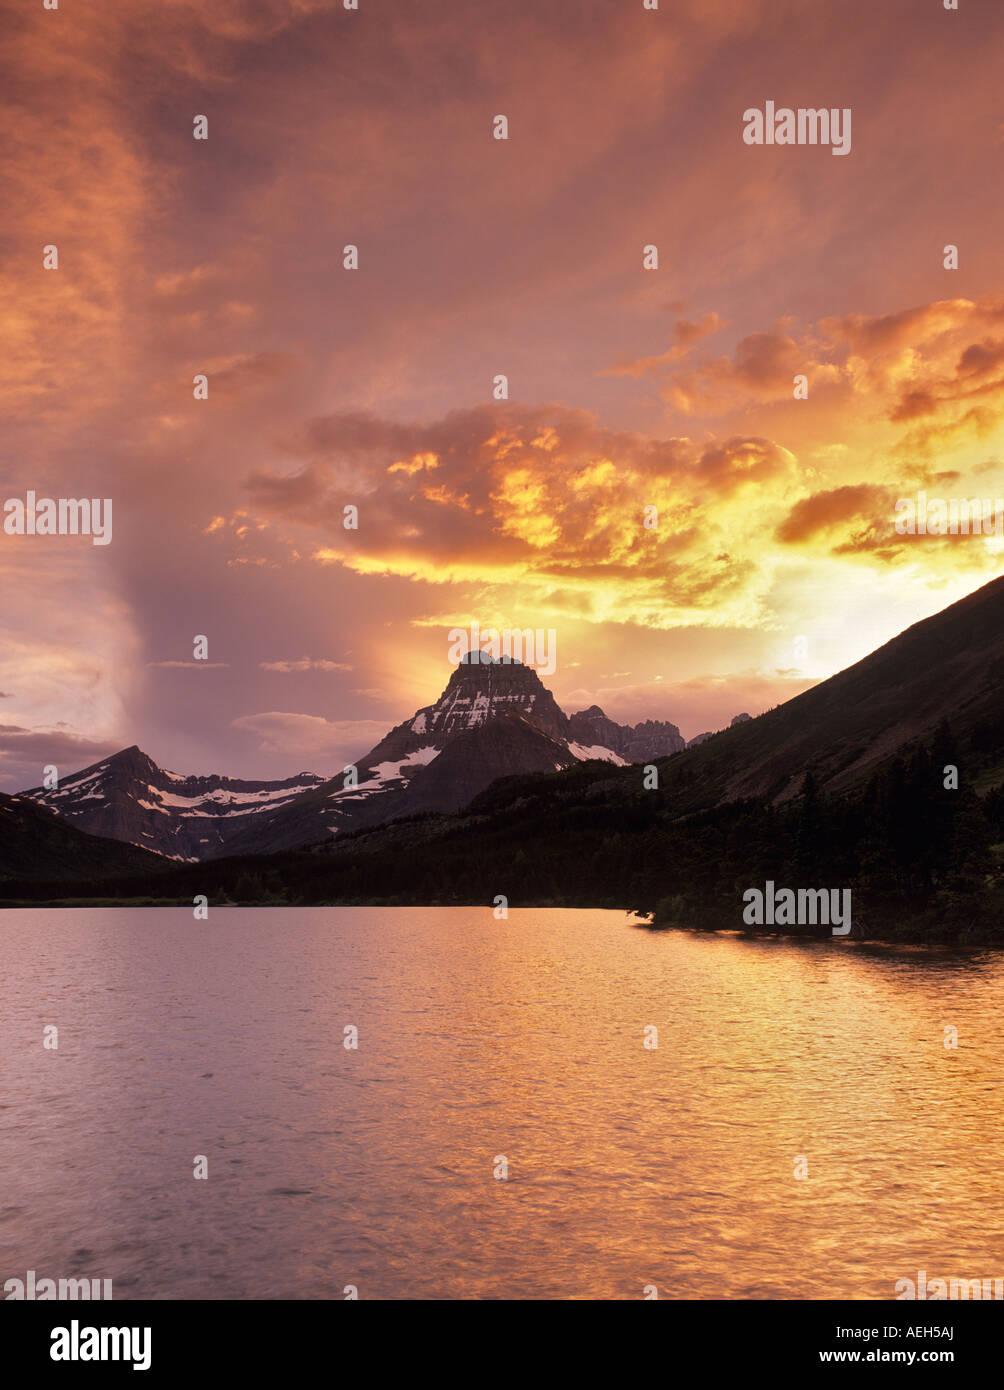 Sonnenuntergang auf Swiftcurrent Lake mit Mount Wilbur Glacier Nationalpark Montana Stockbild